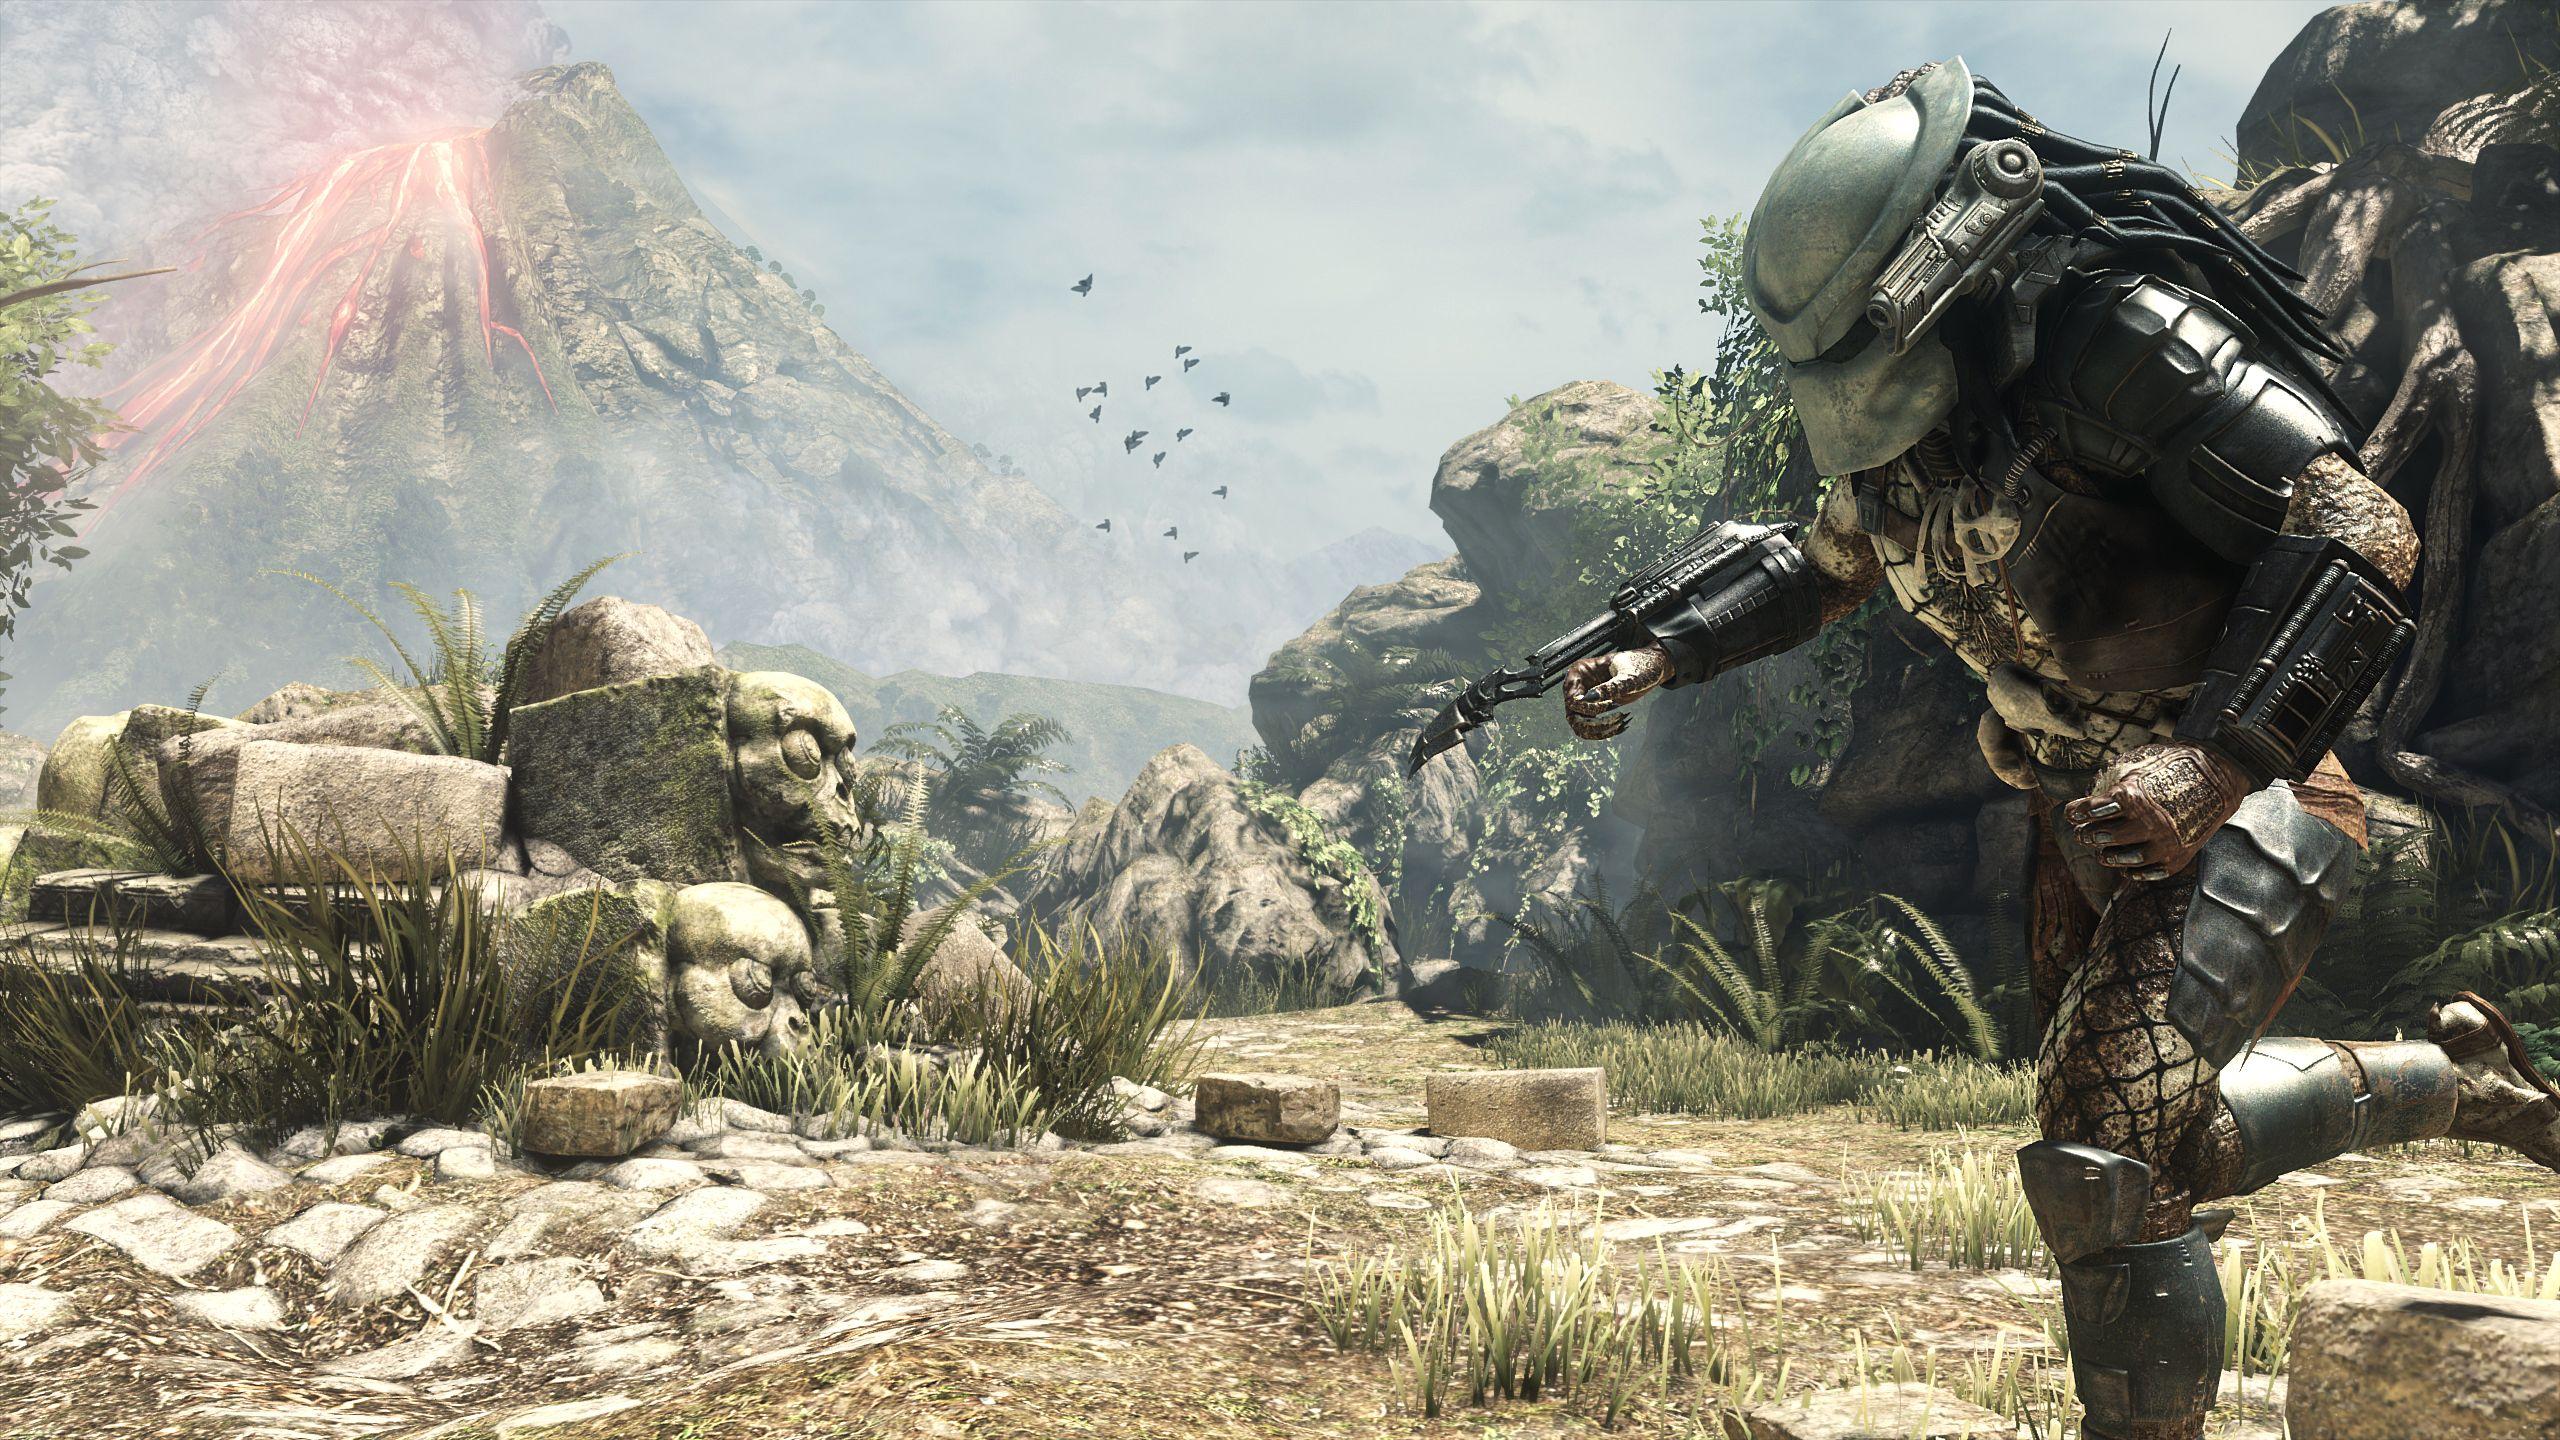 Call Of Duty Ghosts Predator Wallpaper Free Desktop Wallpaper Call Of Duty Ghosts Predator